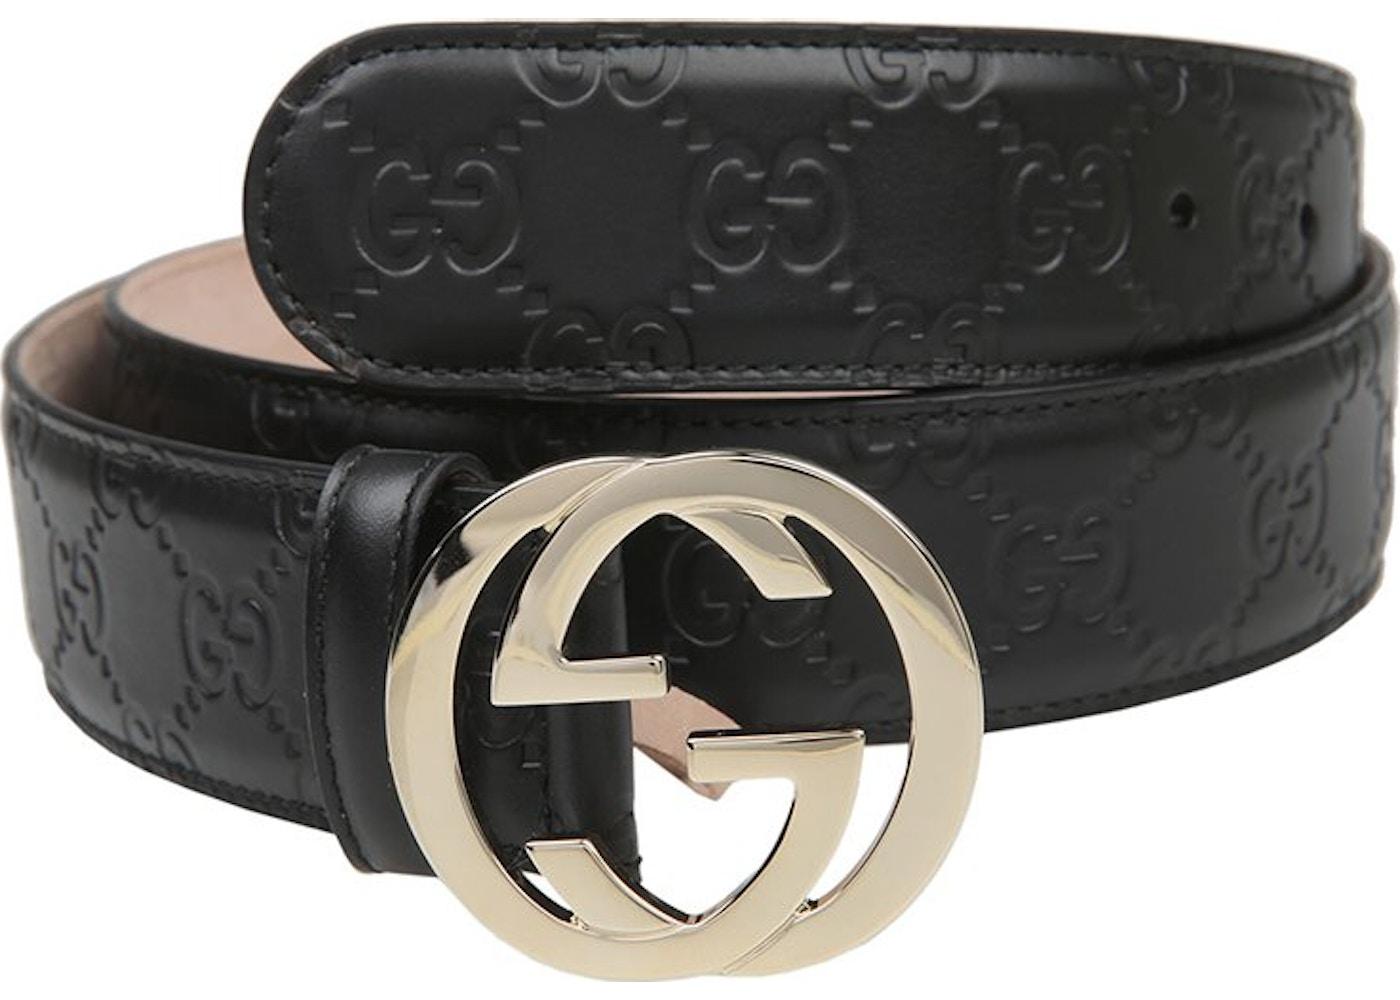 f427d45c8 Gucci Interlocking G Belt Monogram Guccissima Black. Monogram Guccissima  Black